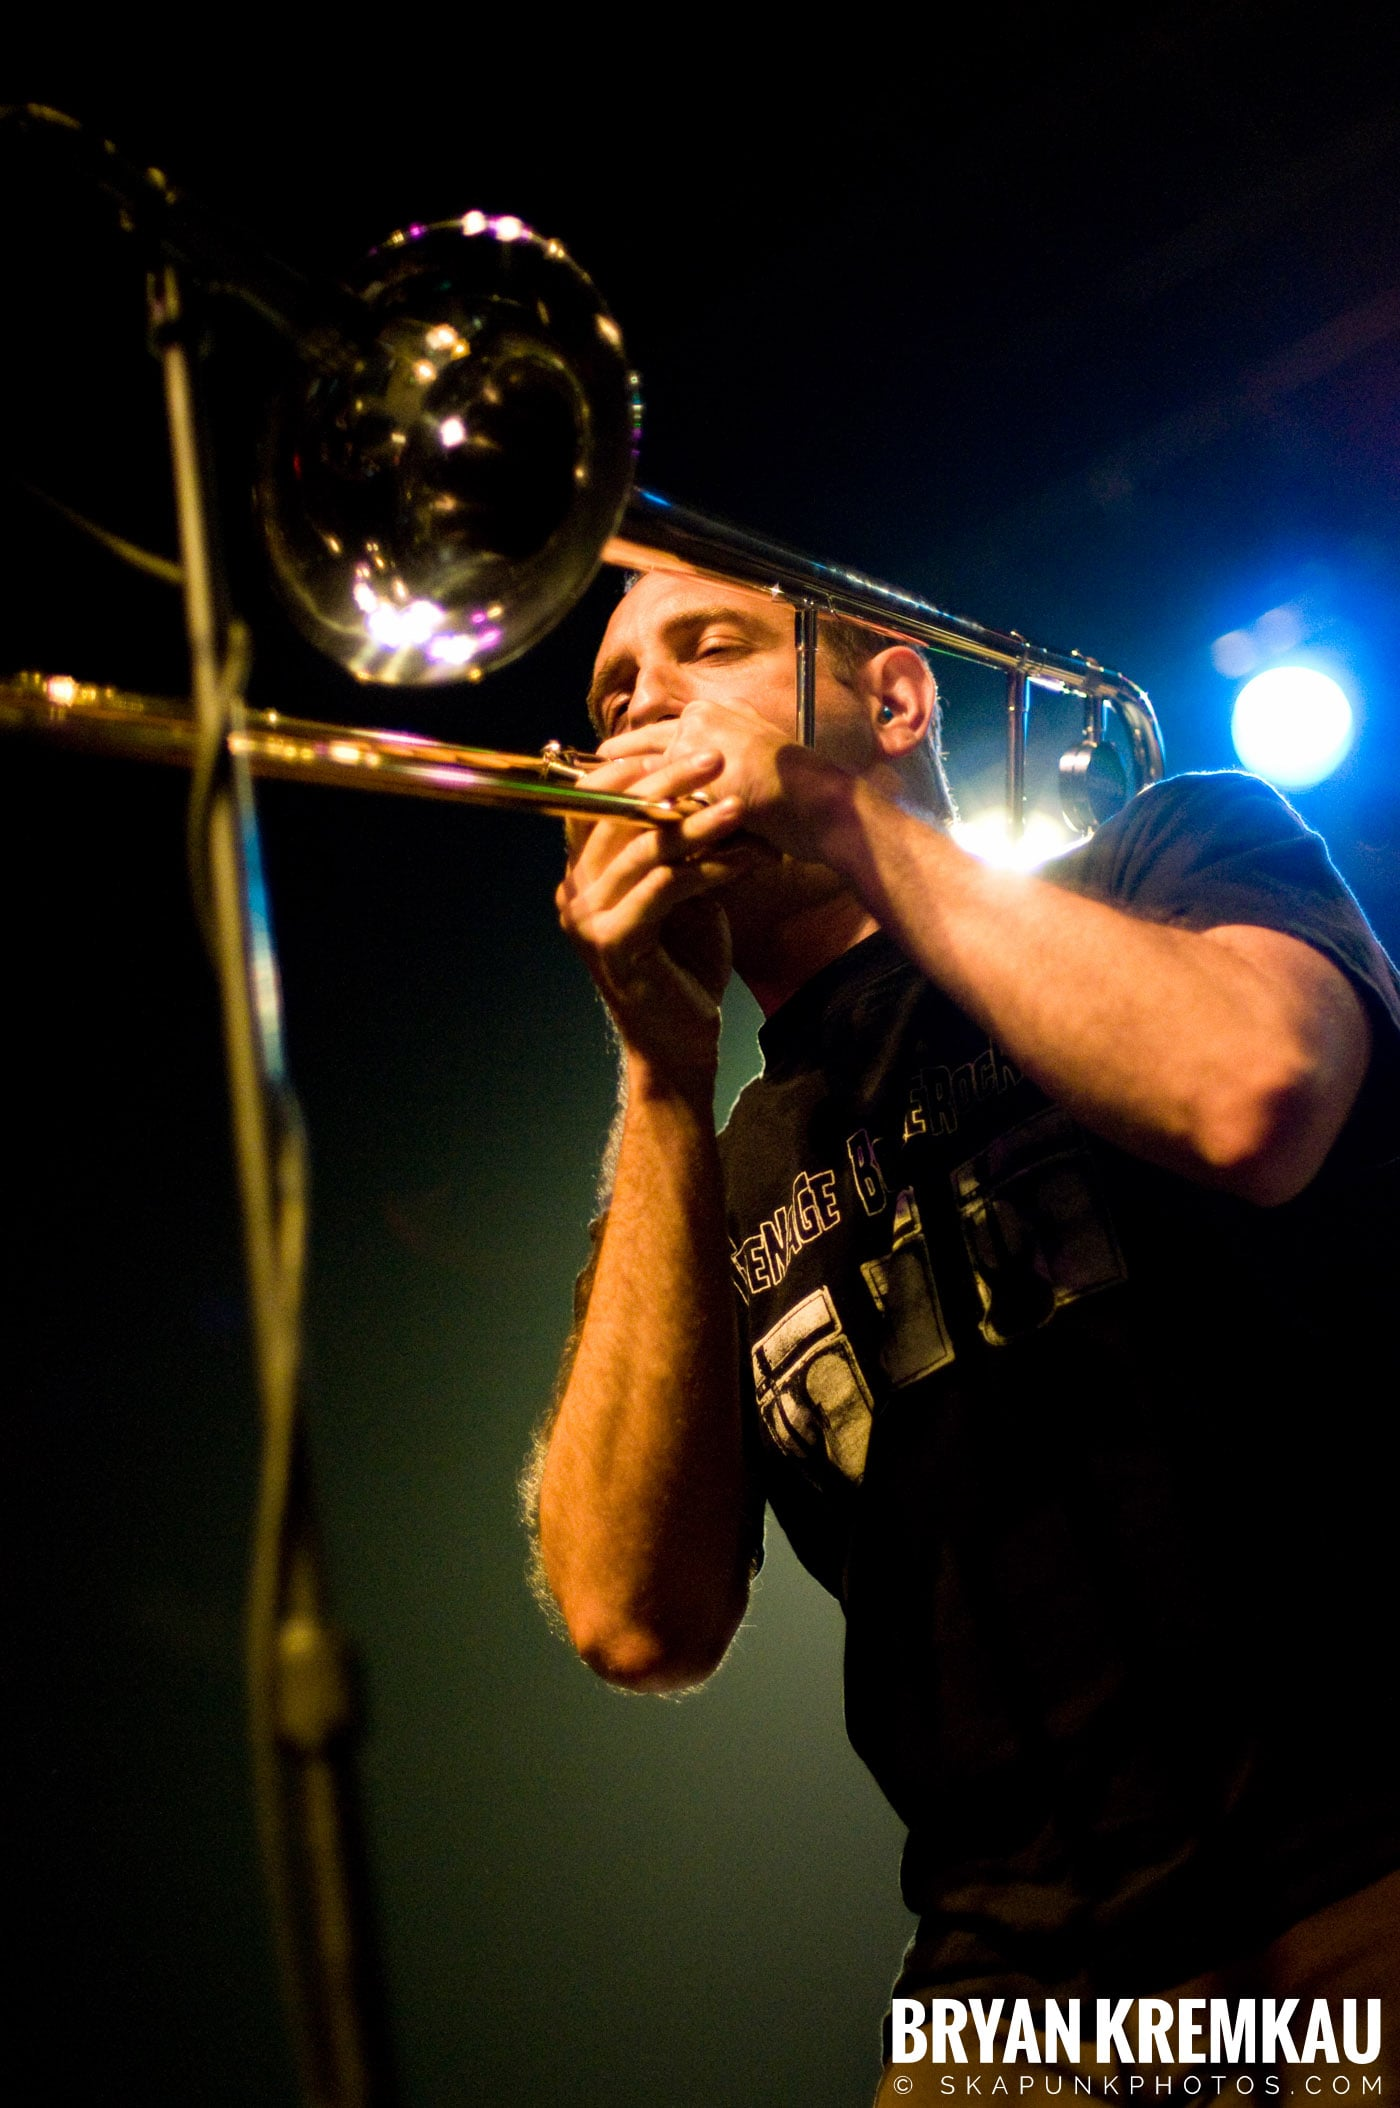 Less Than Jake @ Roseland Ballroom, NYC - 6.26.08 (21)